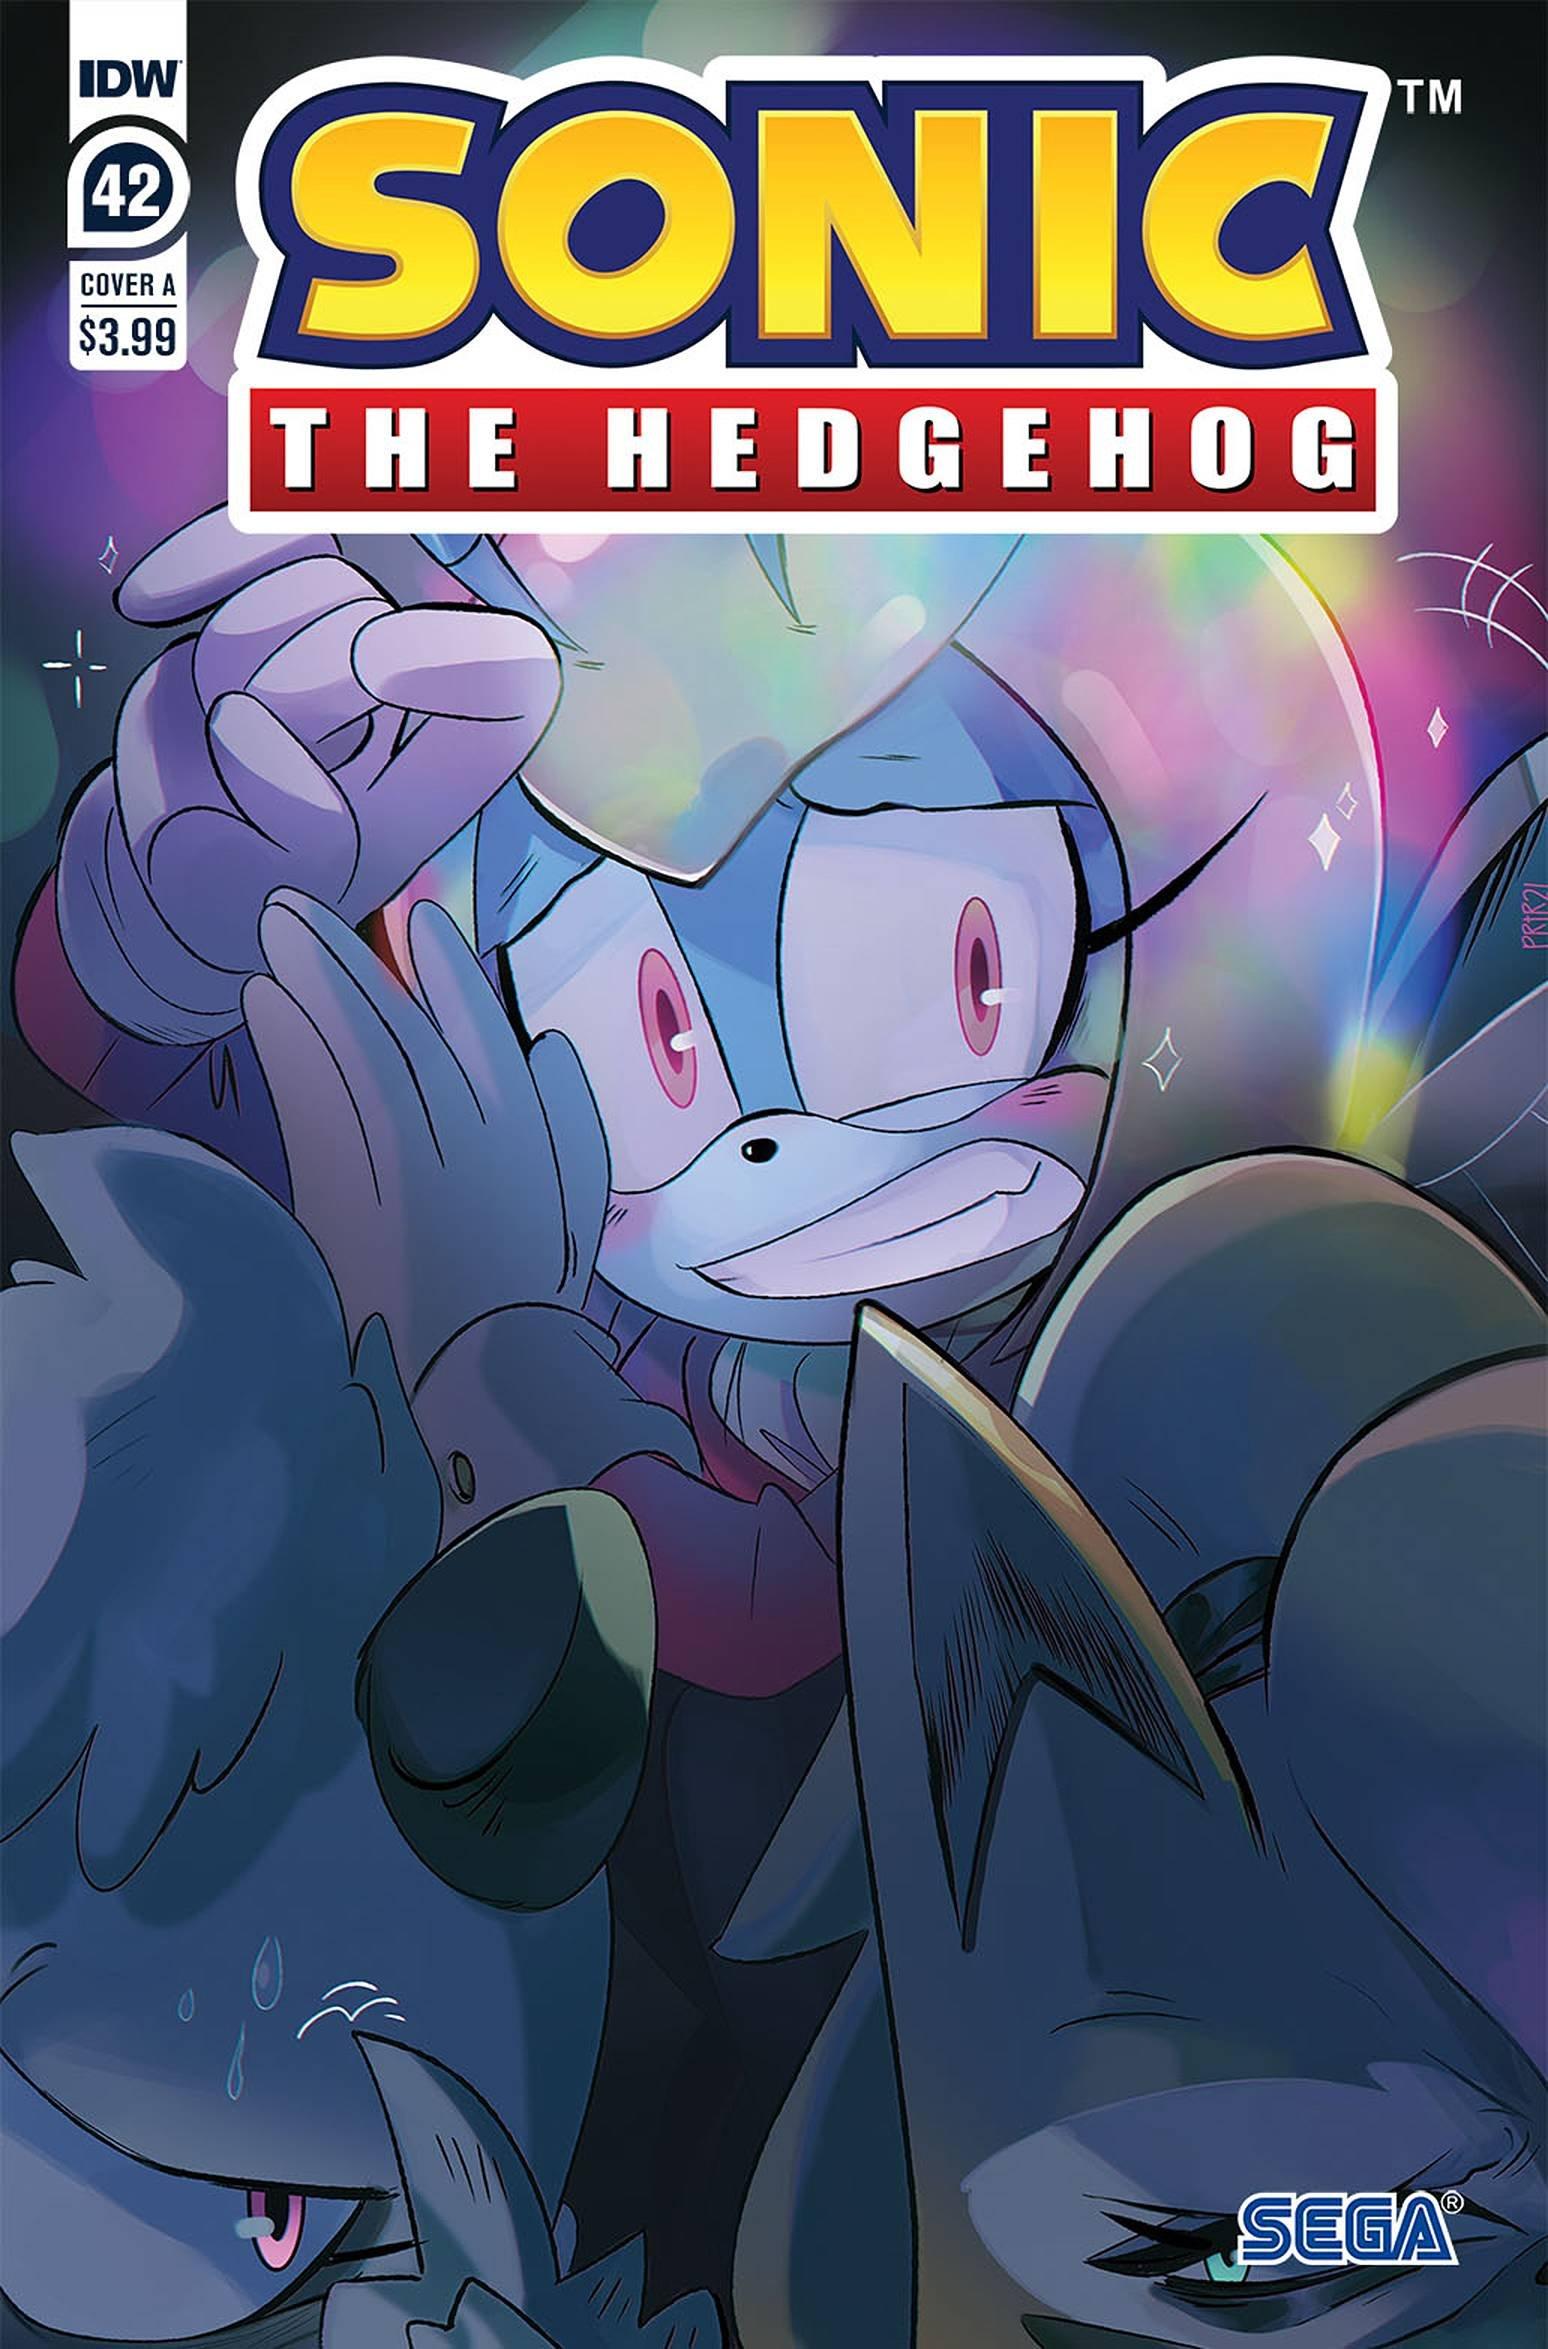 IDW Sonic #42